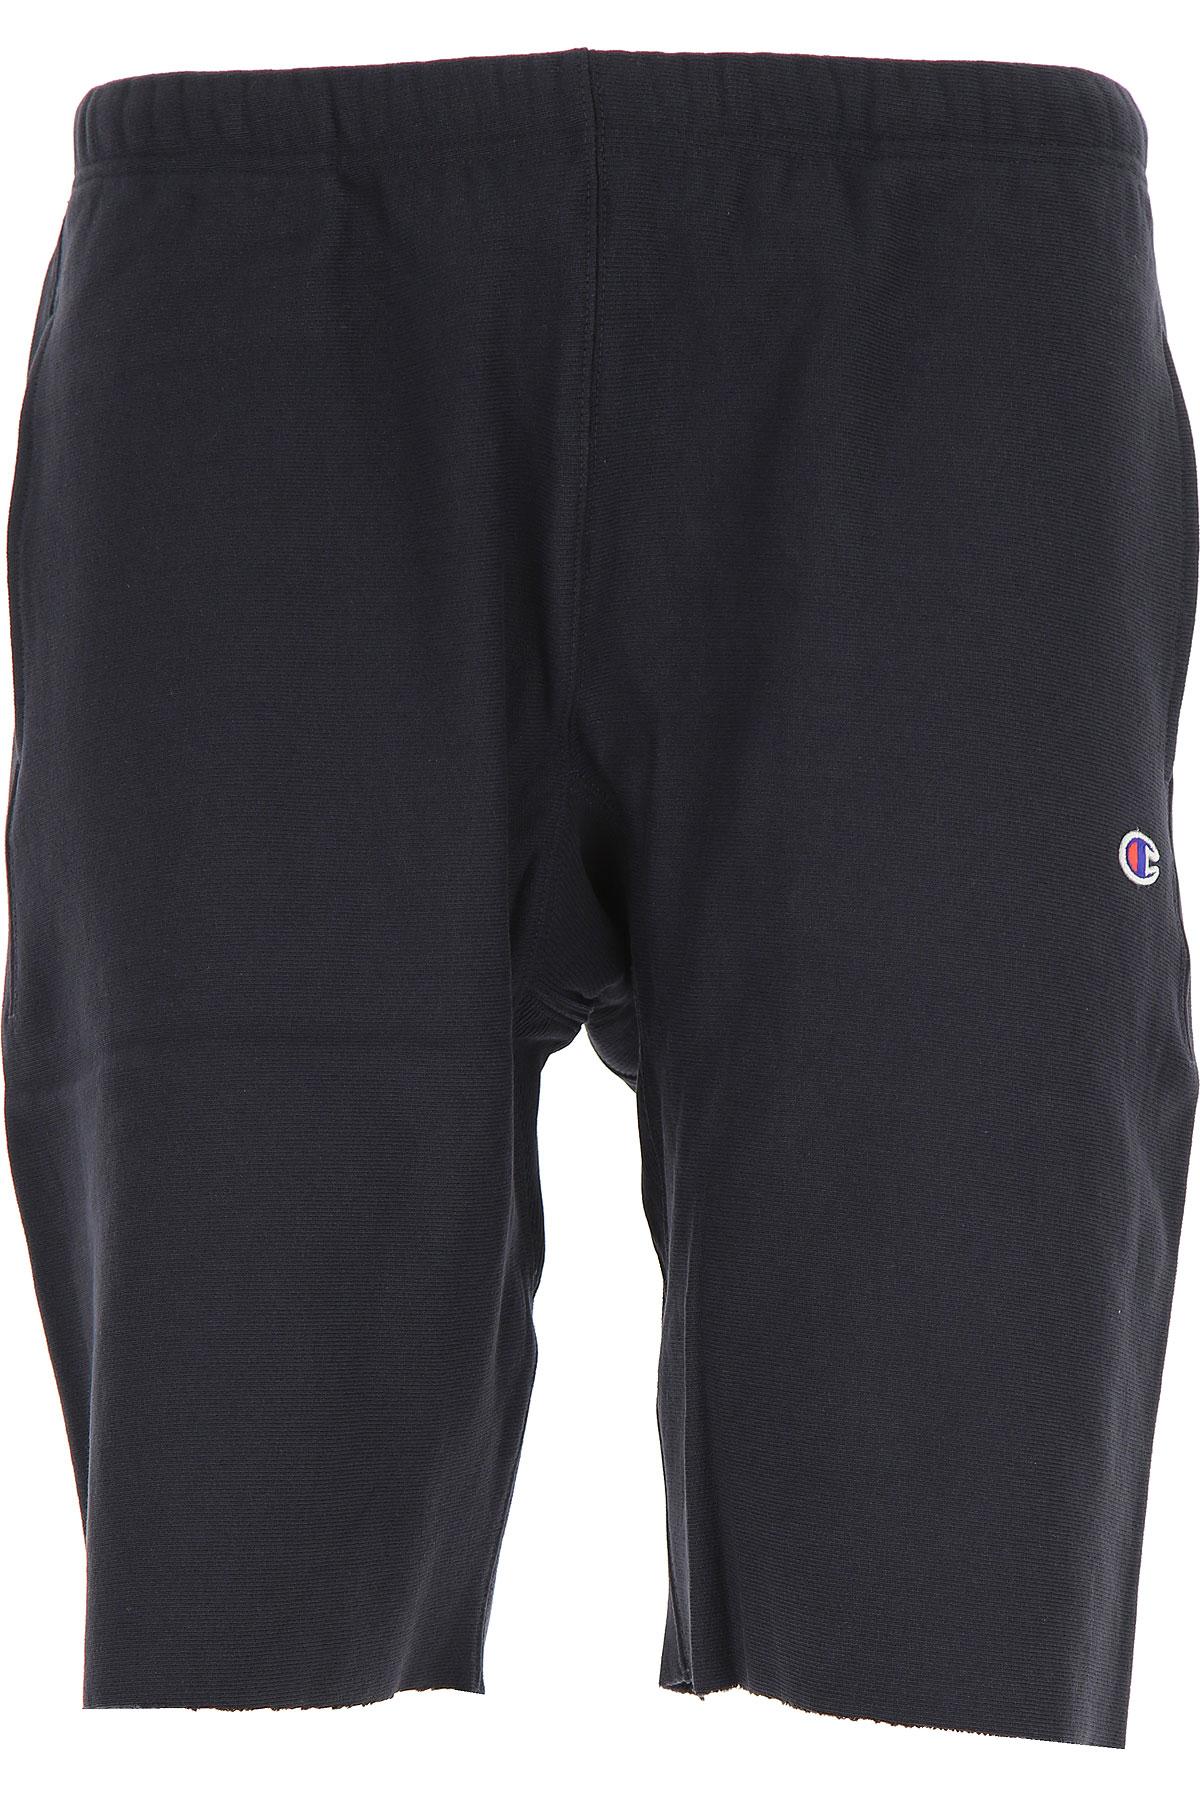 Image of Champion Shorts for Men On Sale, Black, Cotton, 2017, L S XL